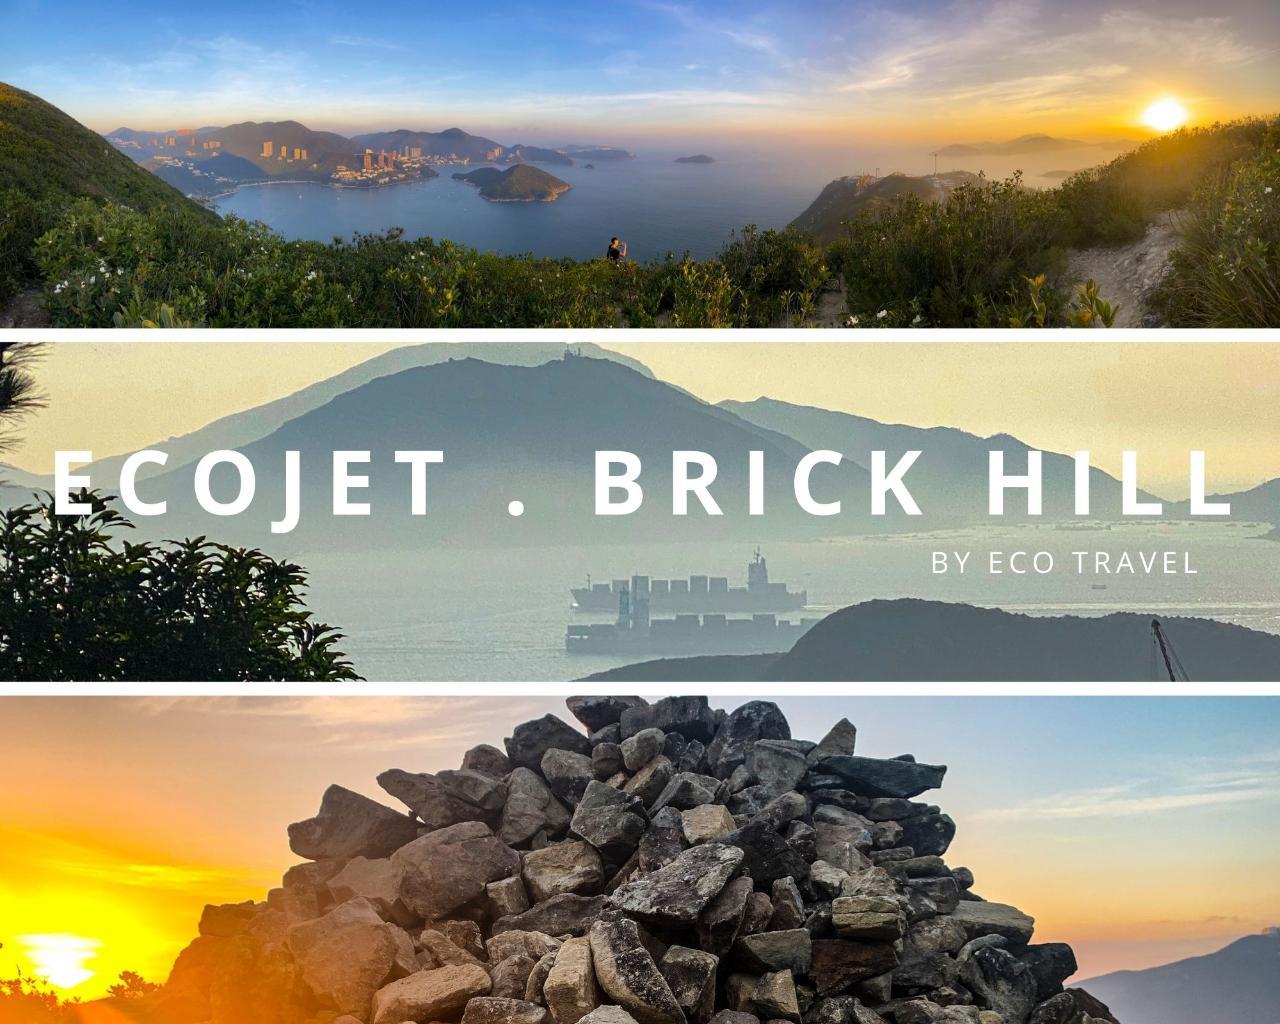 EcoJet.山海經.南朗山  Hiking by the Sea(Brick Hill)